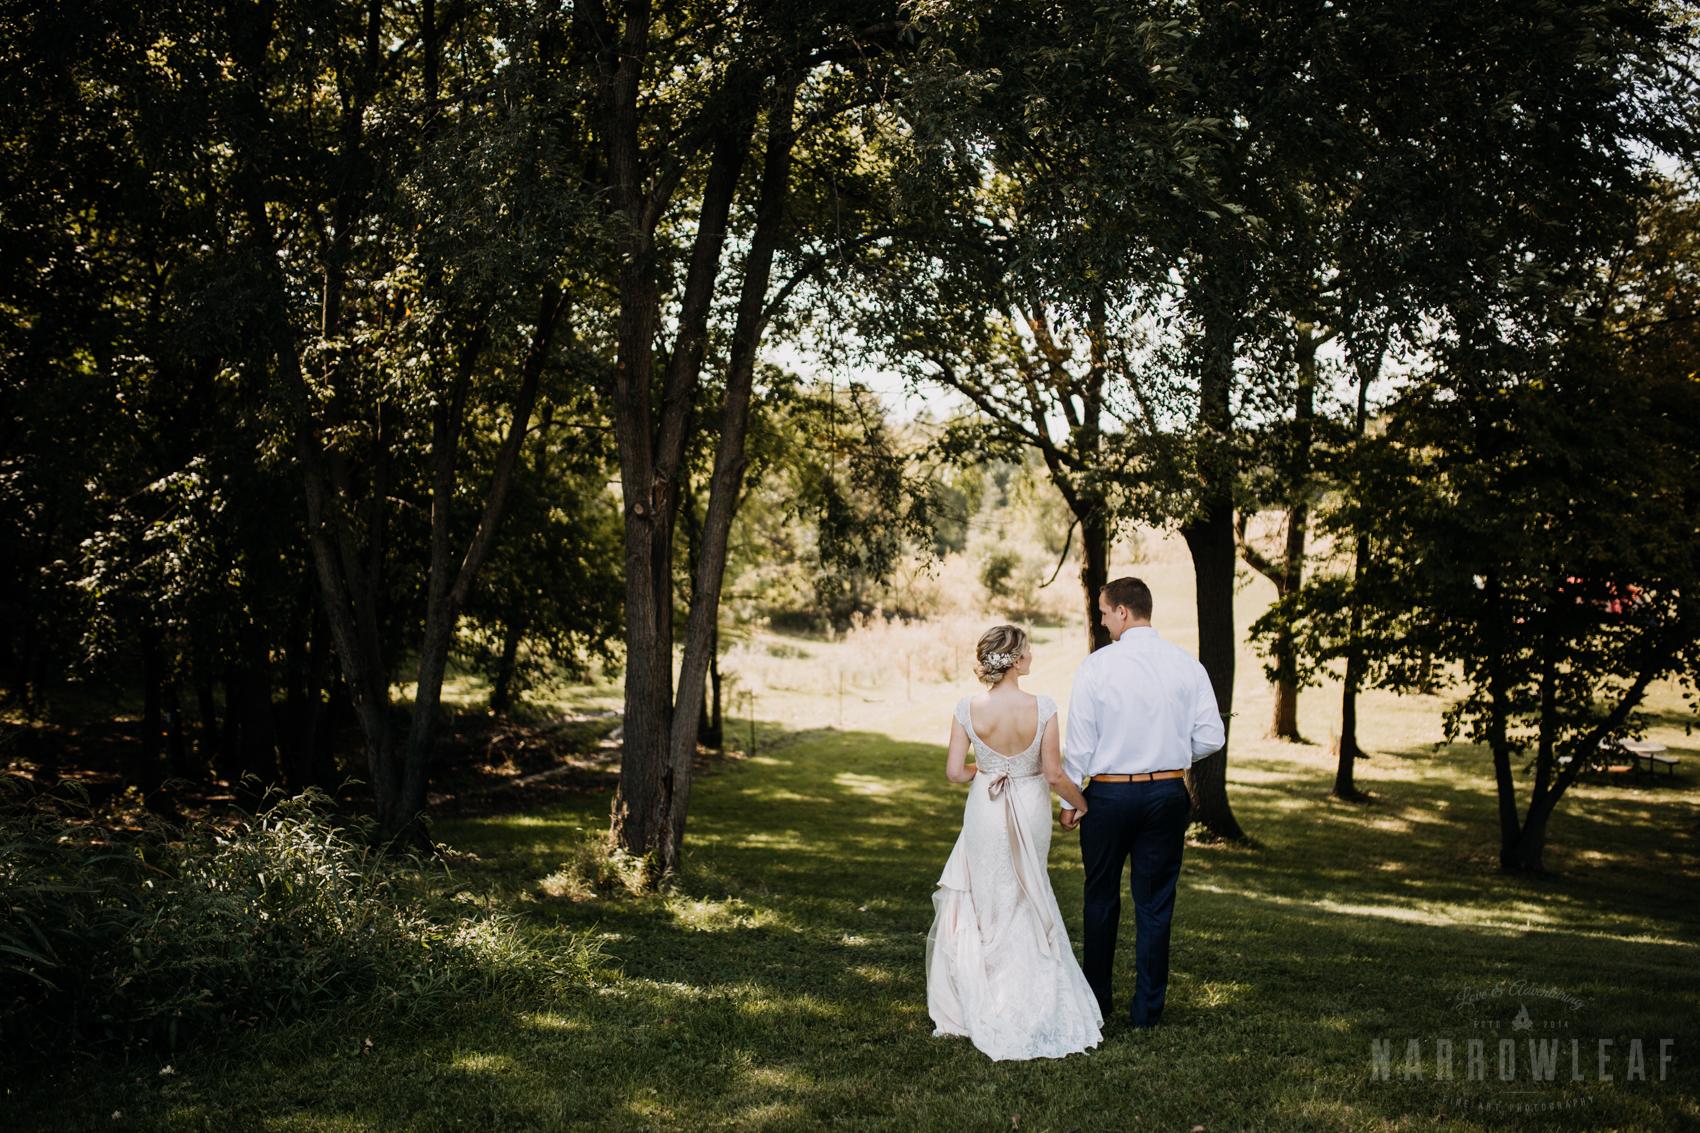 bride-groom-classy-wedding-photos-outdoors-36.jpg